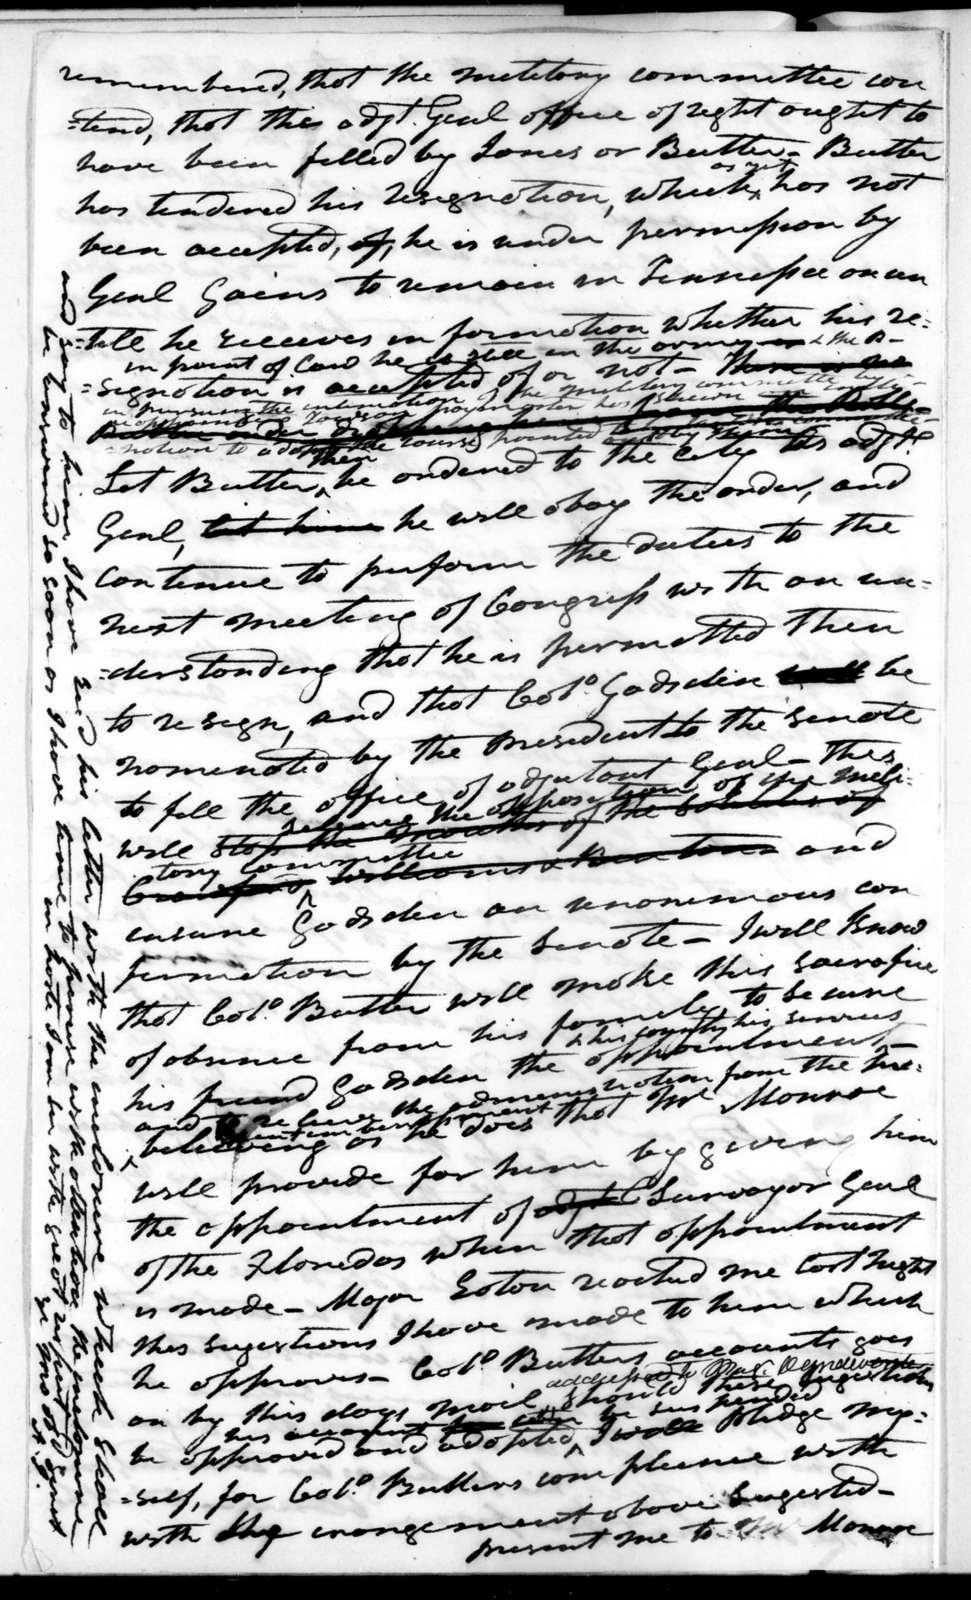 Andrew Jackson to John Caldwell Calhoun, June 28, 1822